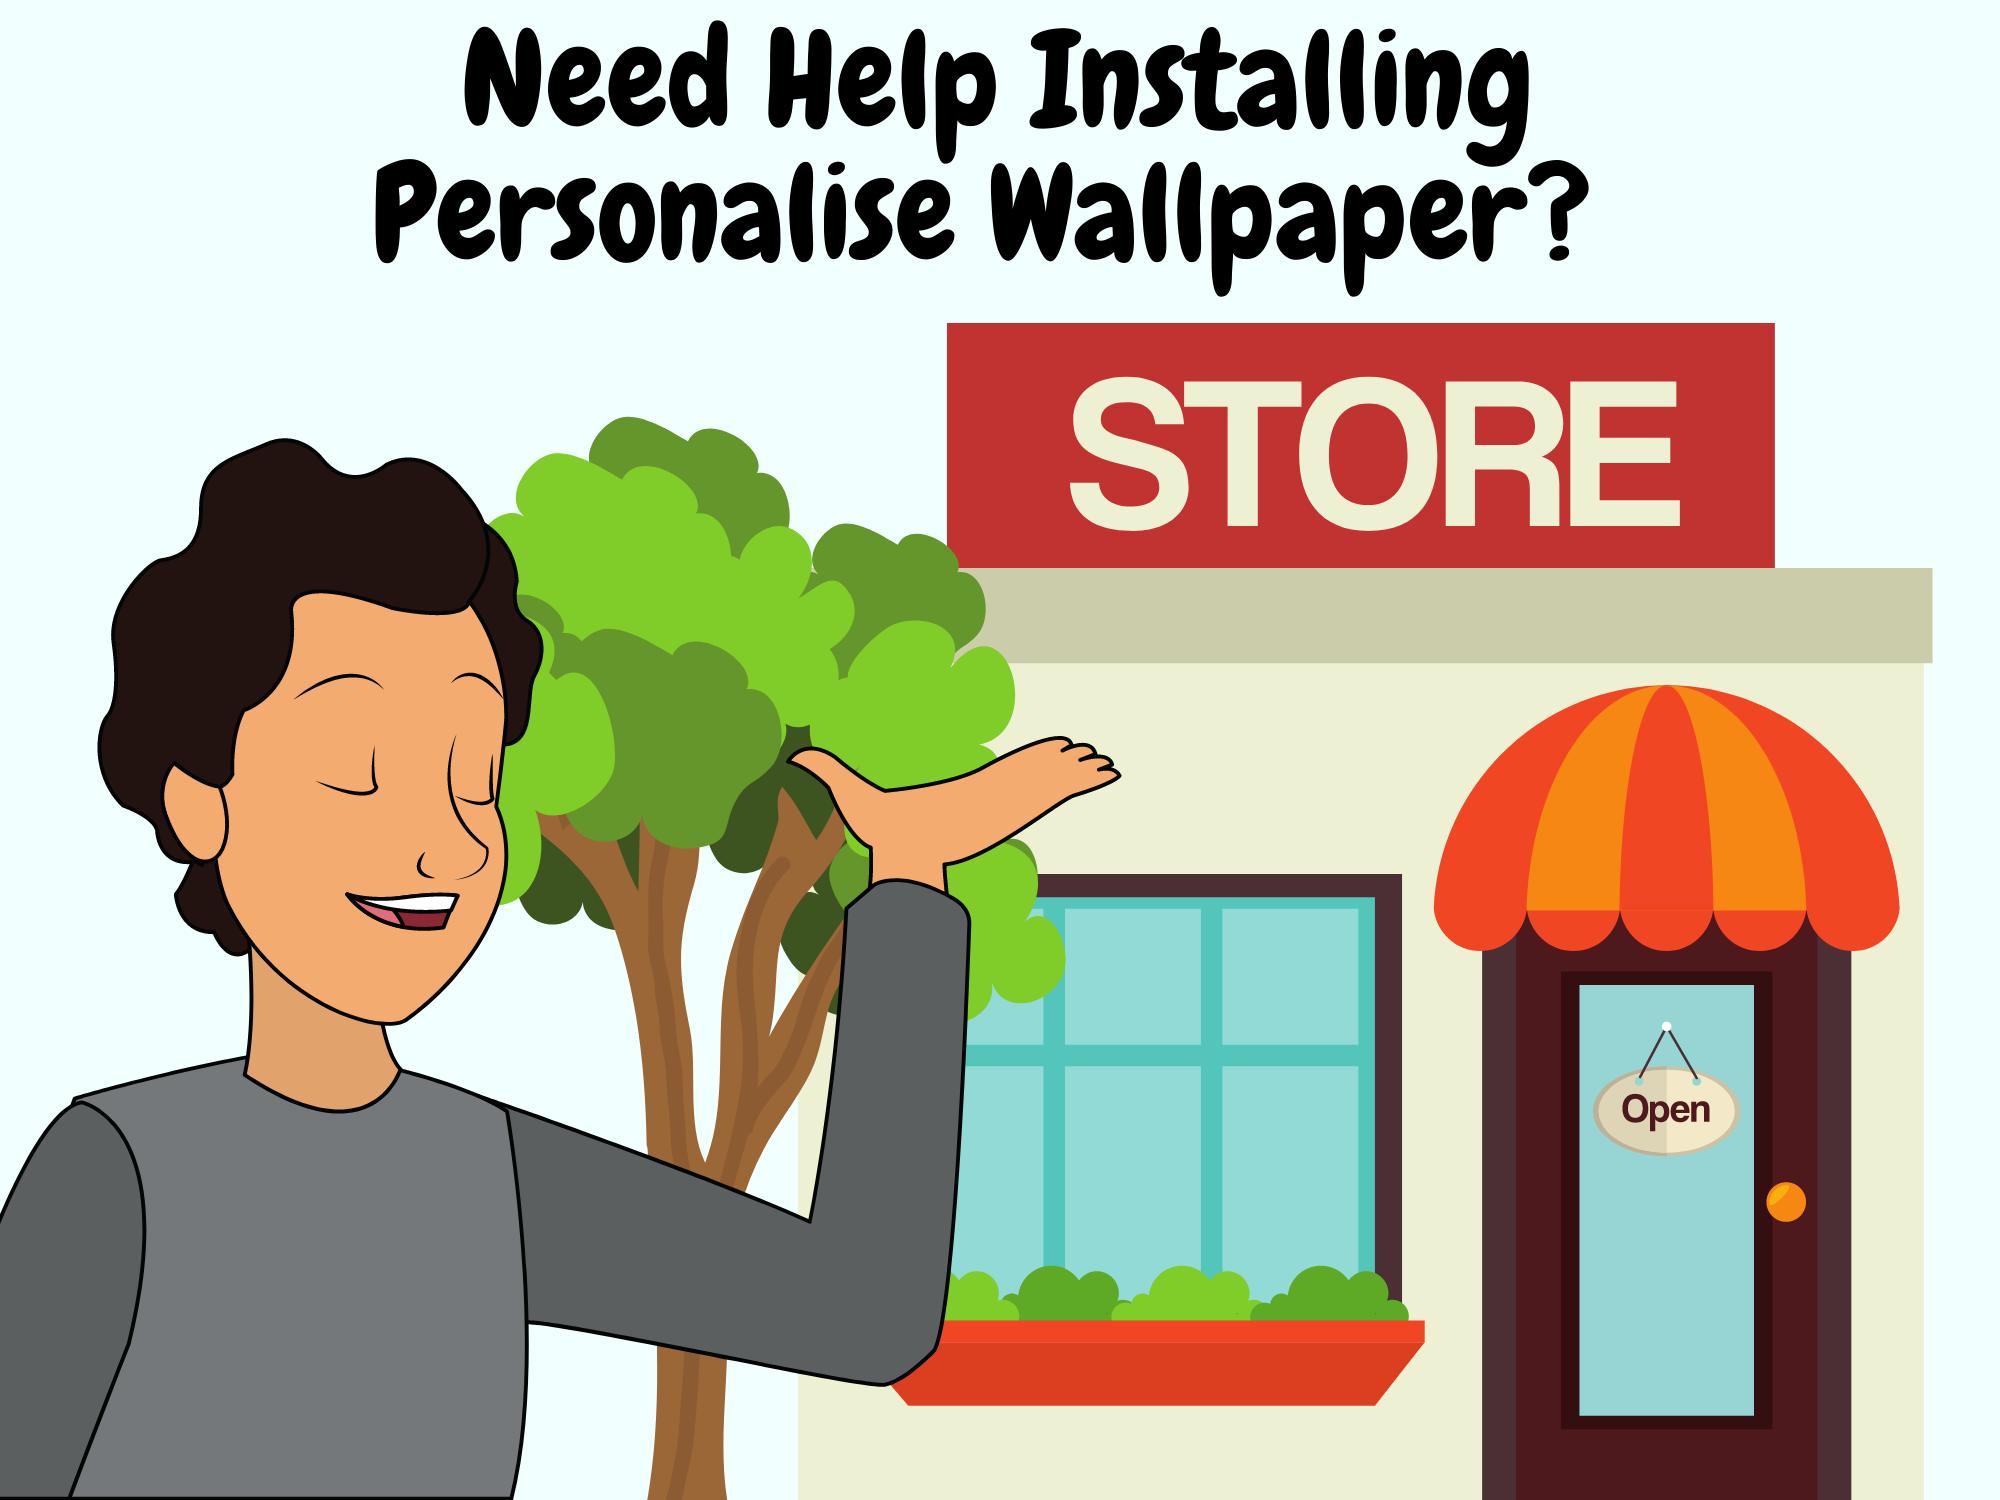 Need-Help-Installing-Personalise-Wallpaper